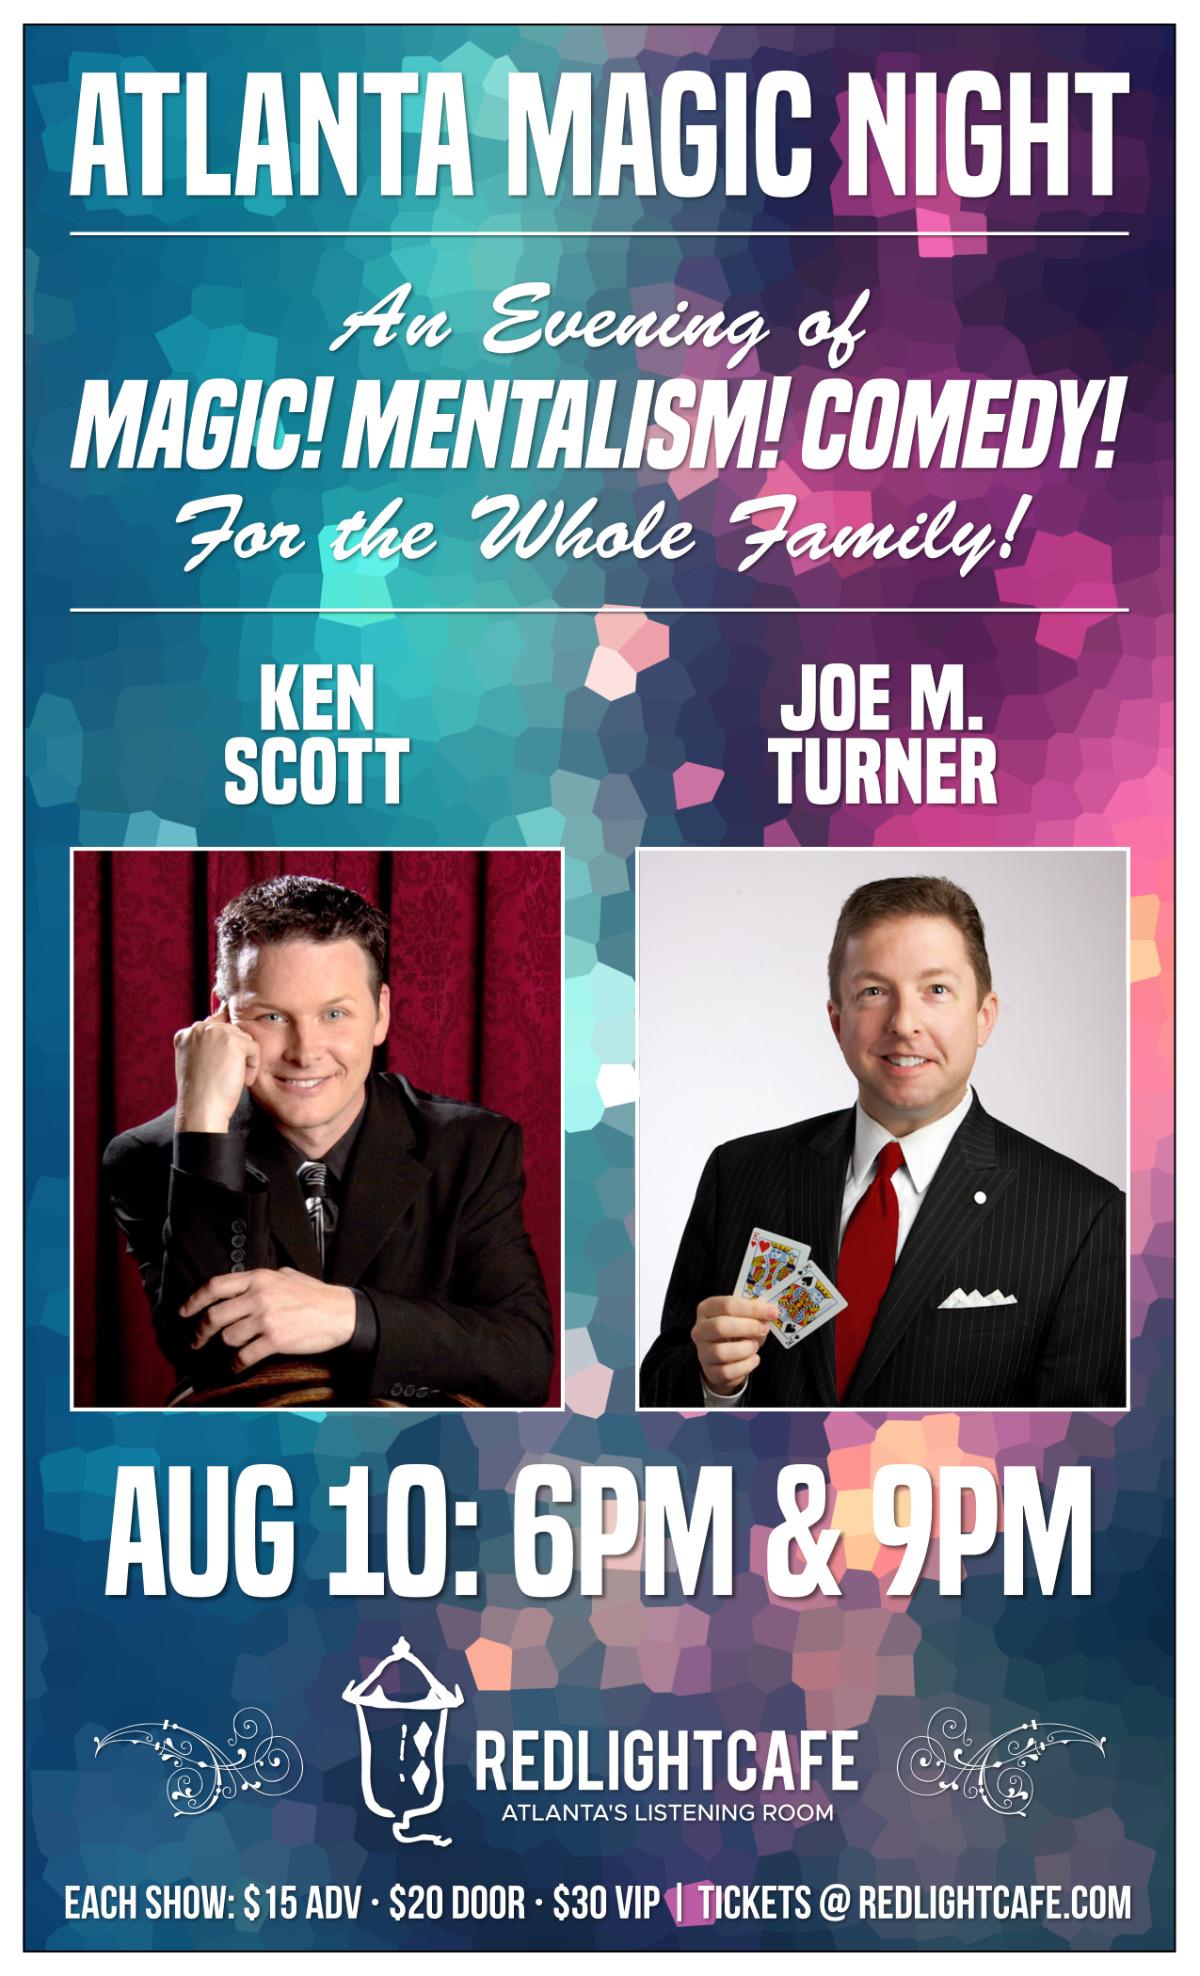 Atlanta Magic Night! w/ Ken Scott + Joe M. Turner - 9 PM SHOW — August 10, 2019 — Red Light Café, Atlanta, GA